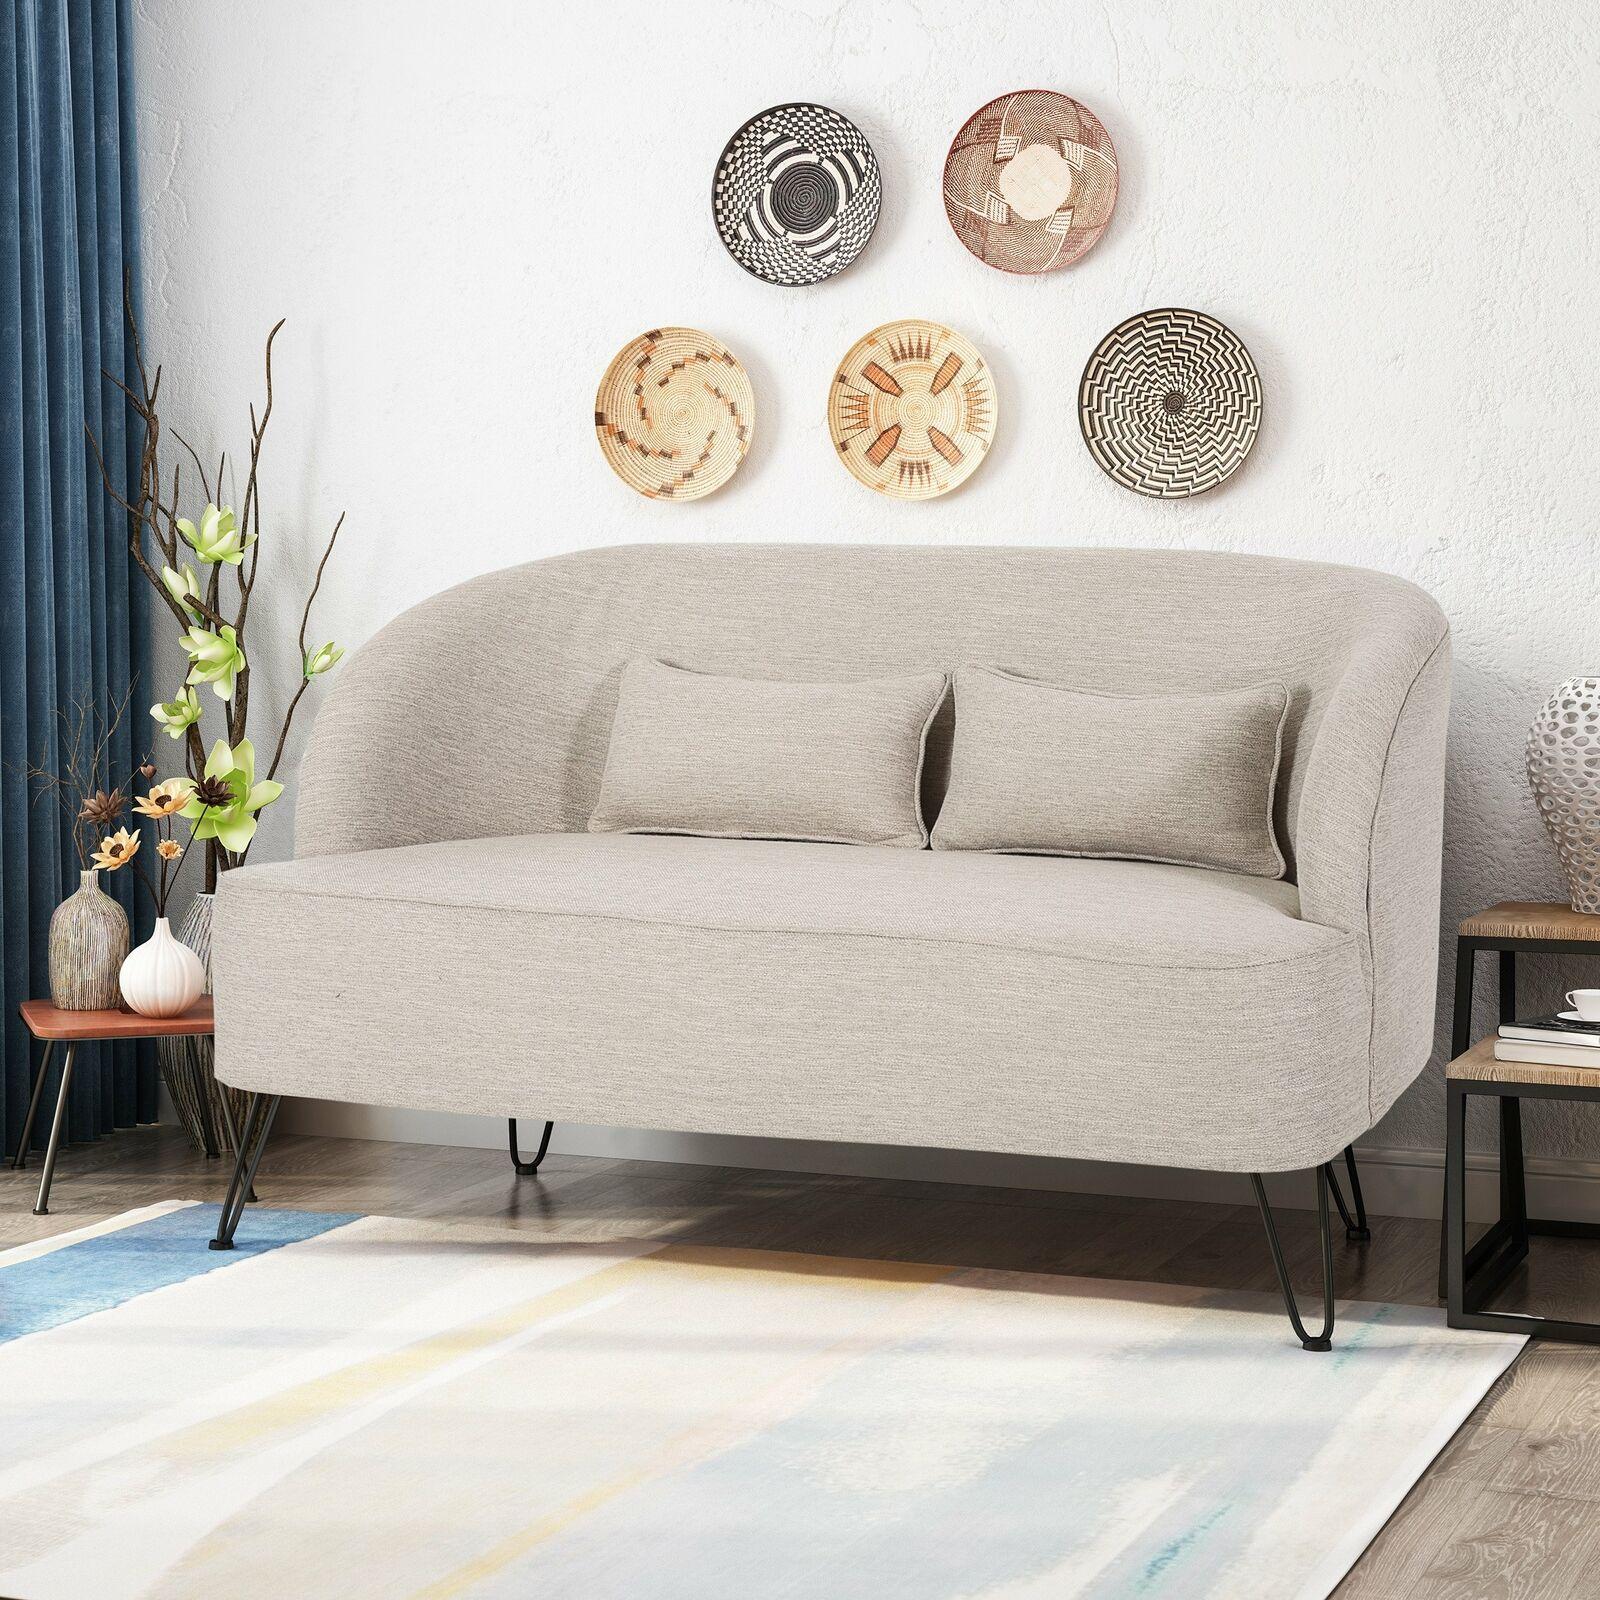 Jordan Modern Fabric Loveseat with Hairpin Legs Furniture